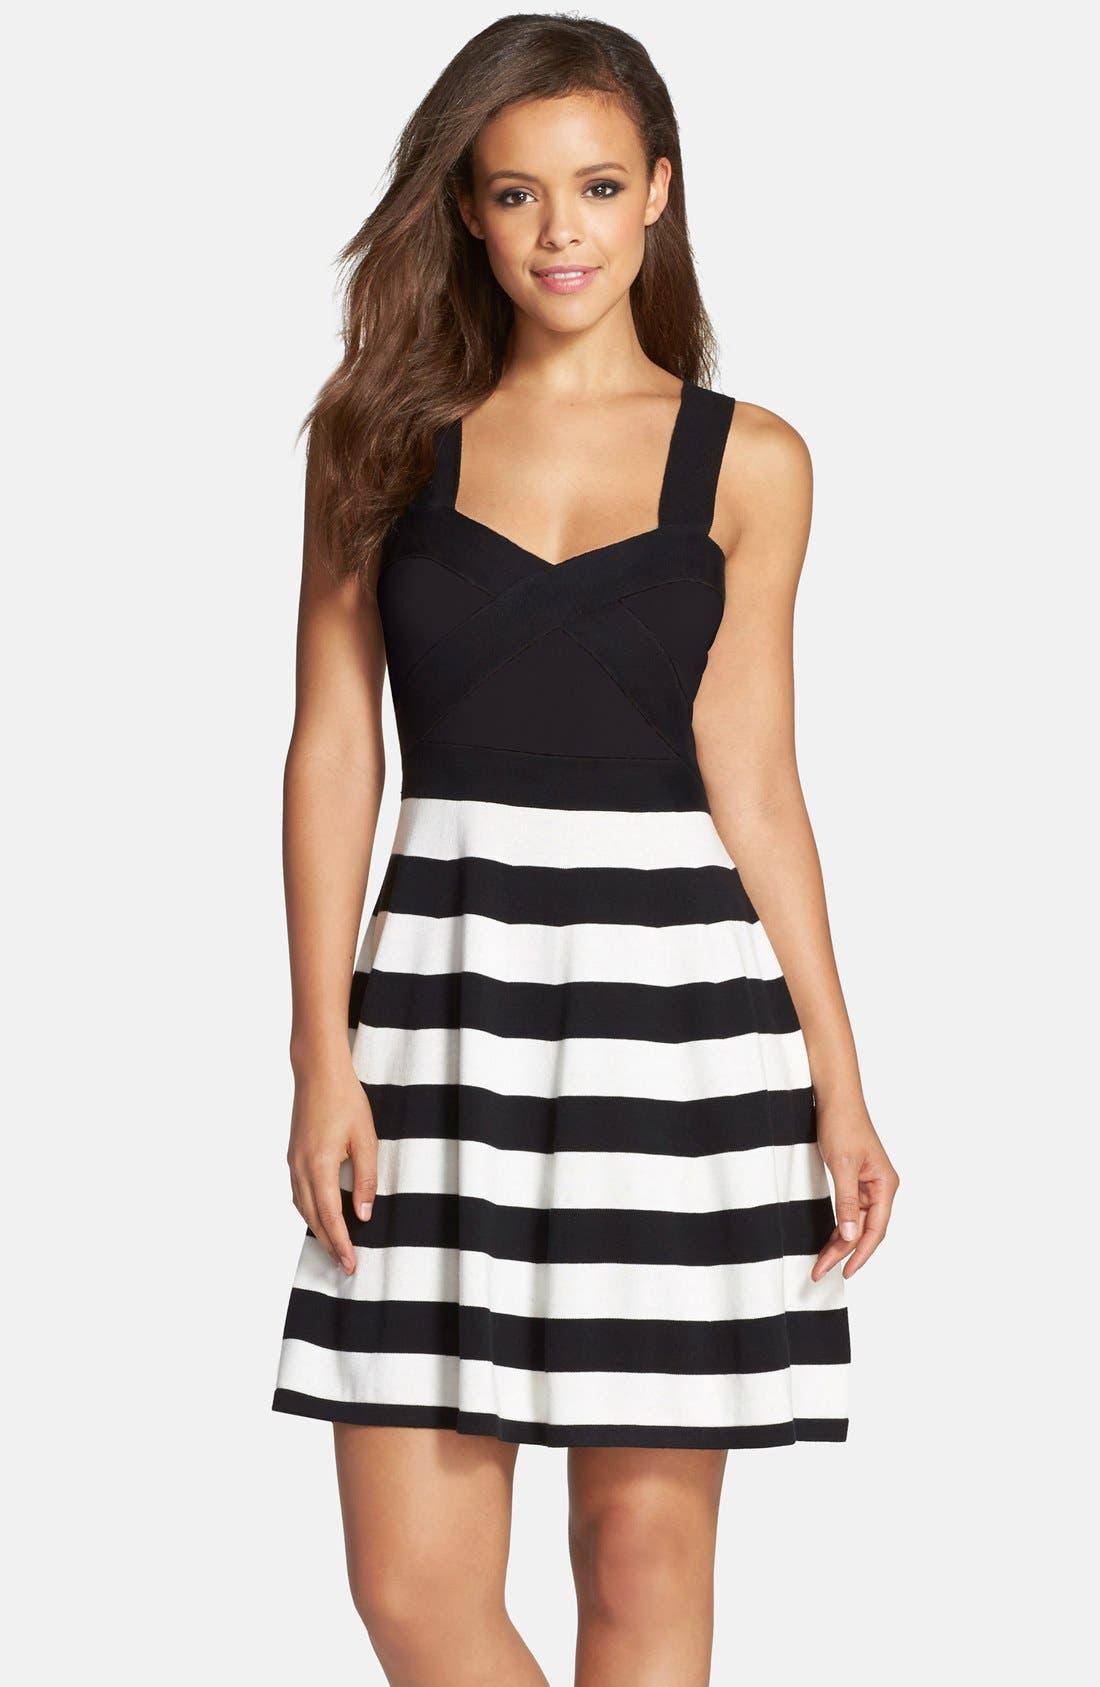 Alternate Image 1 Selected - Trina Turk 'Envy' Stripe Sweater Dress